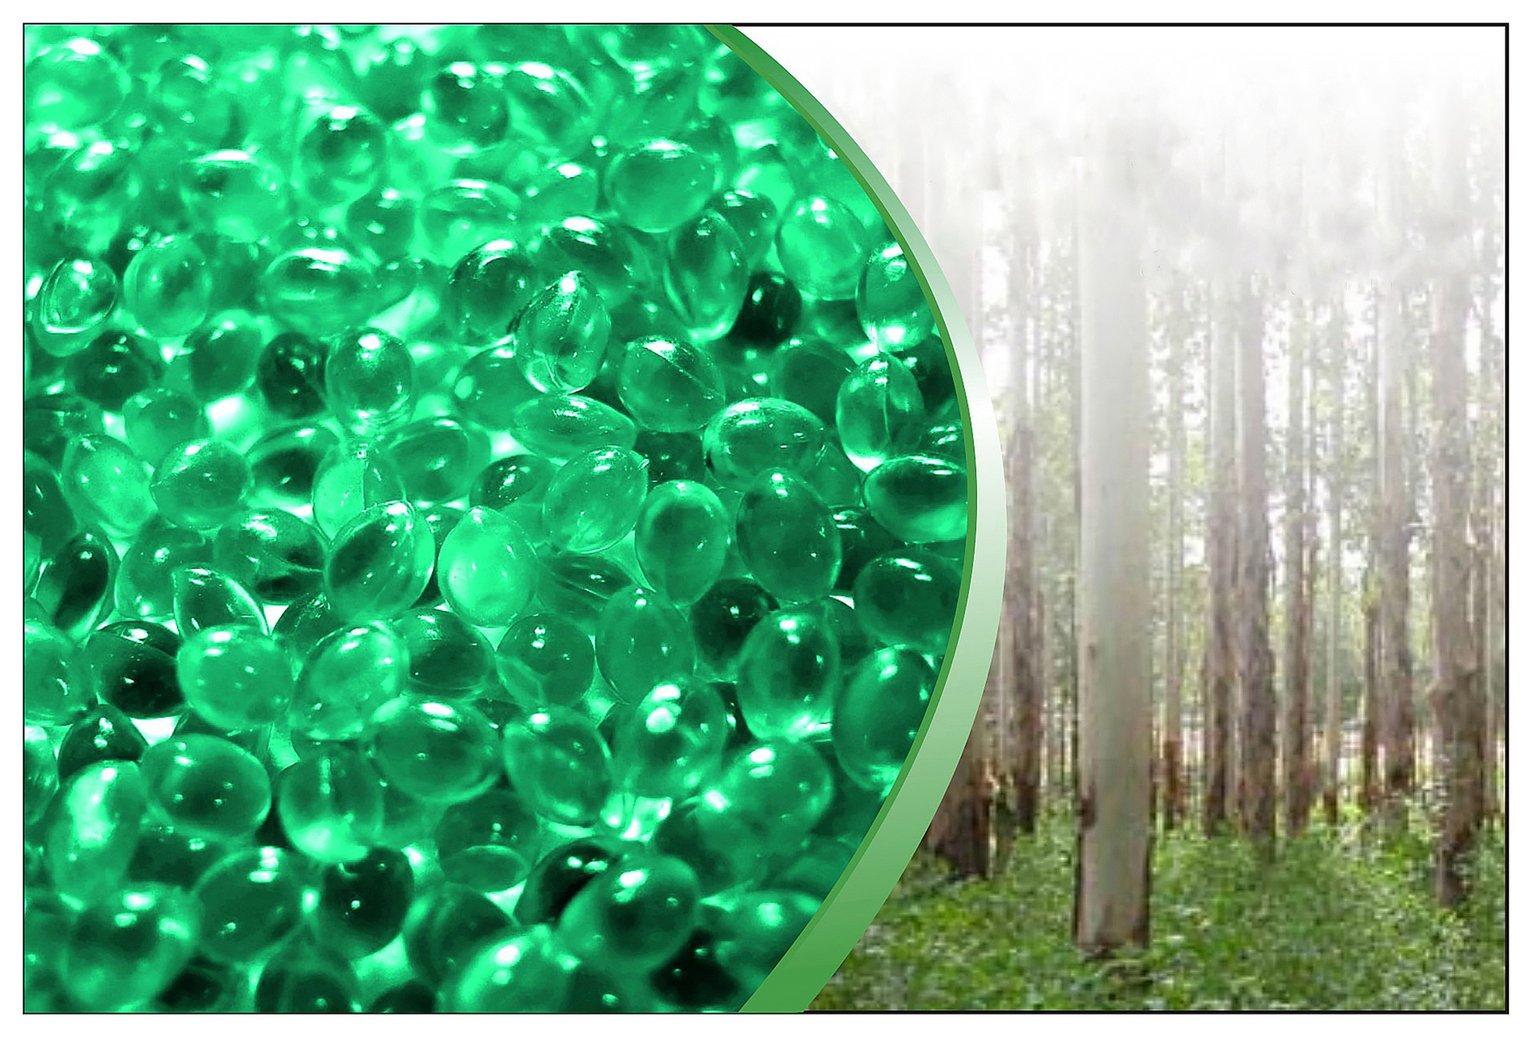 Canadian Spa Hot Tub Aromatherapy Eucalyptus Scent